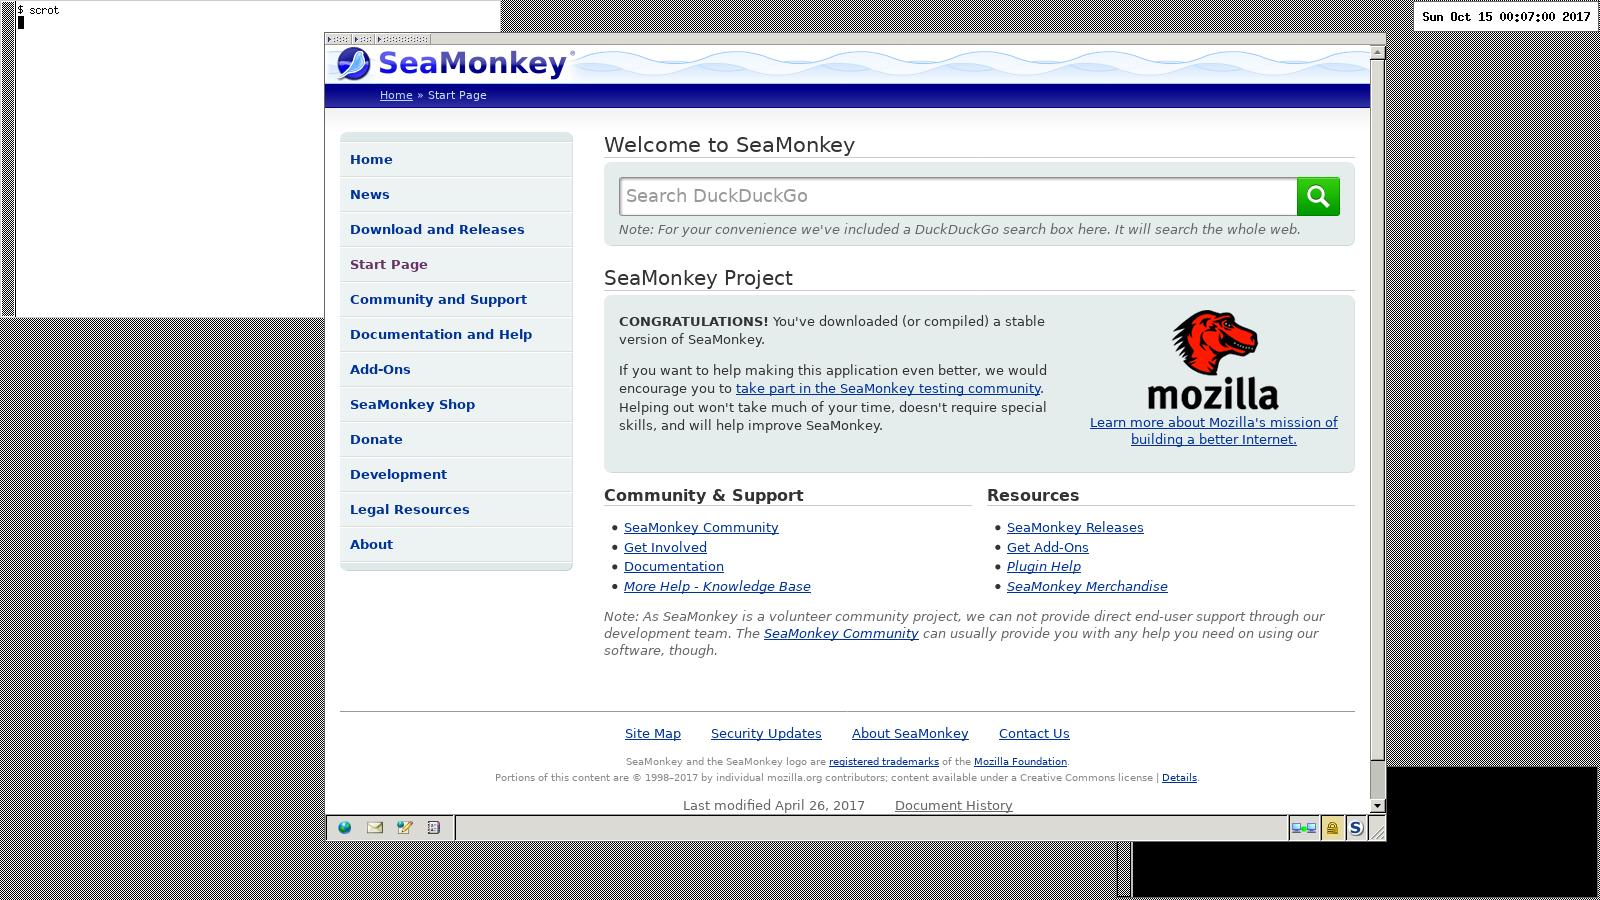 Share Your Desktop! (5) | Trisquel GNU/Linux - Run free!